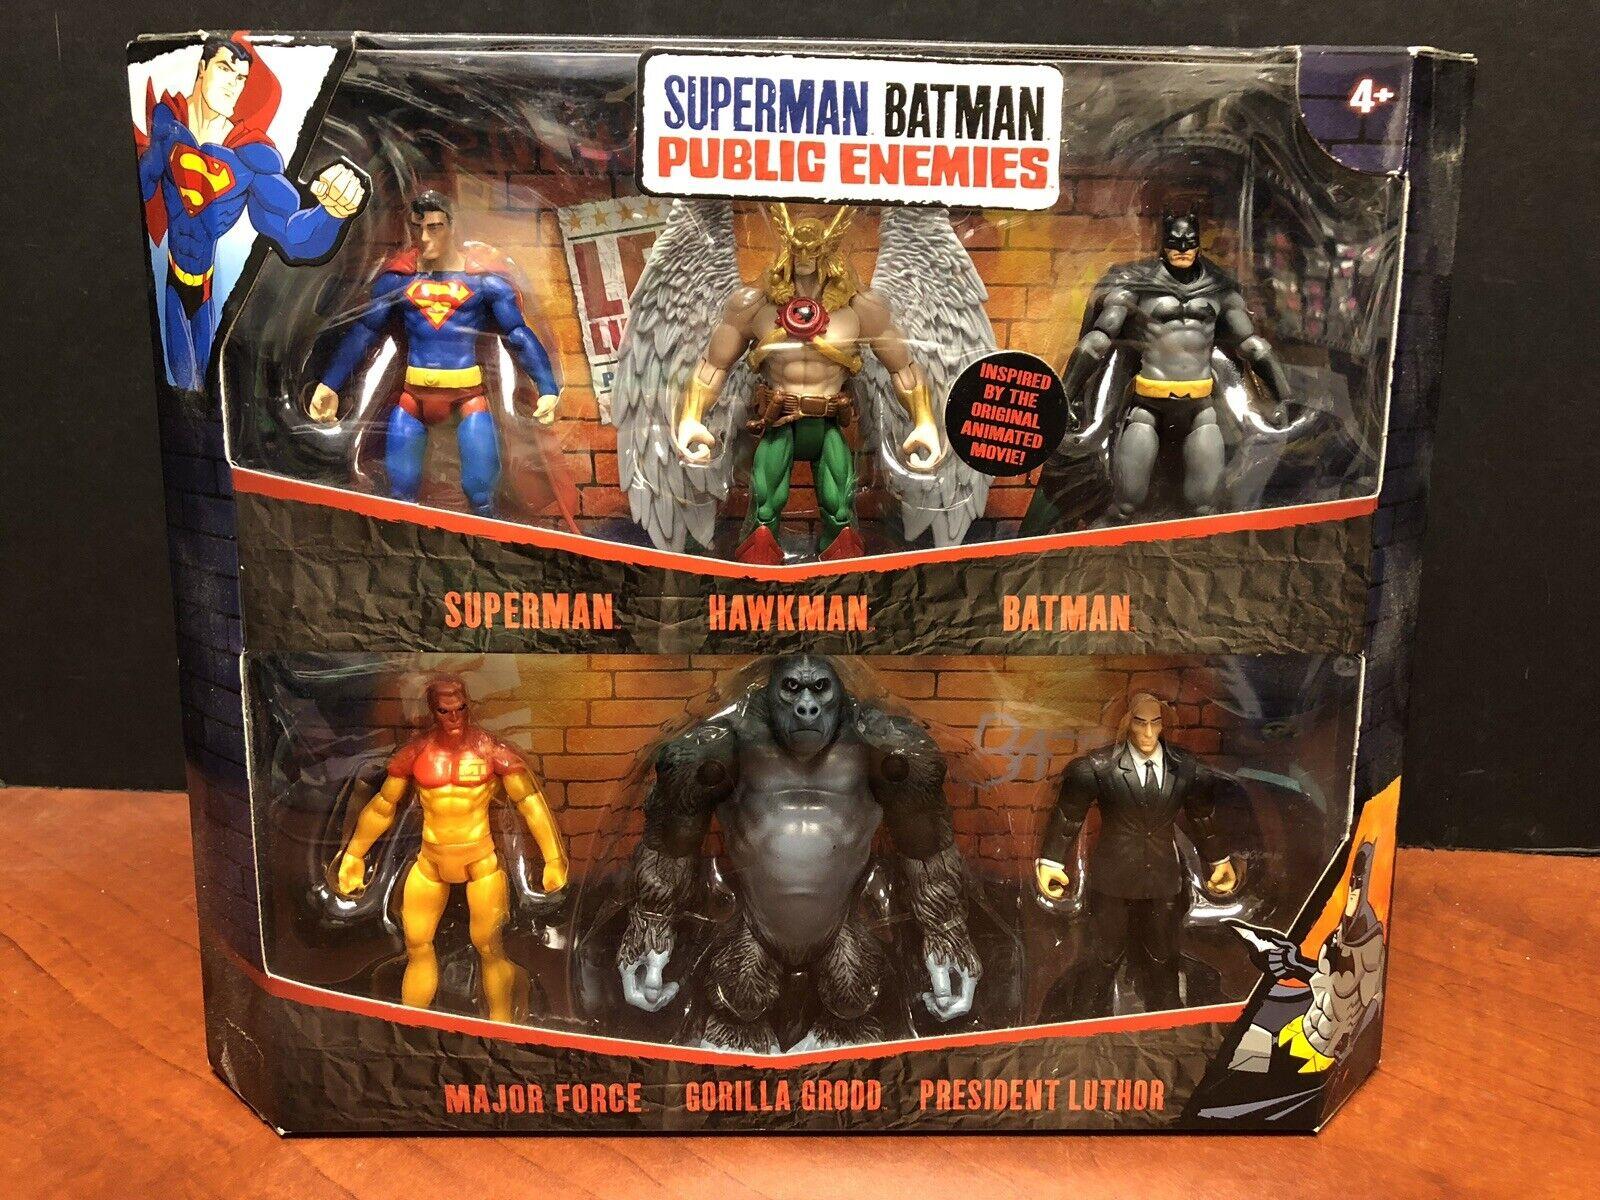 DC Superuomo Batuomo Public Enemies  Infinite Heroes 6 cifra Set TAMP0136  qualità ufficiale